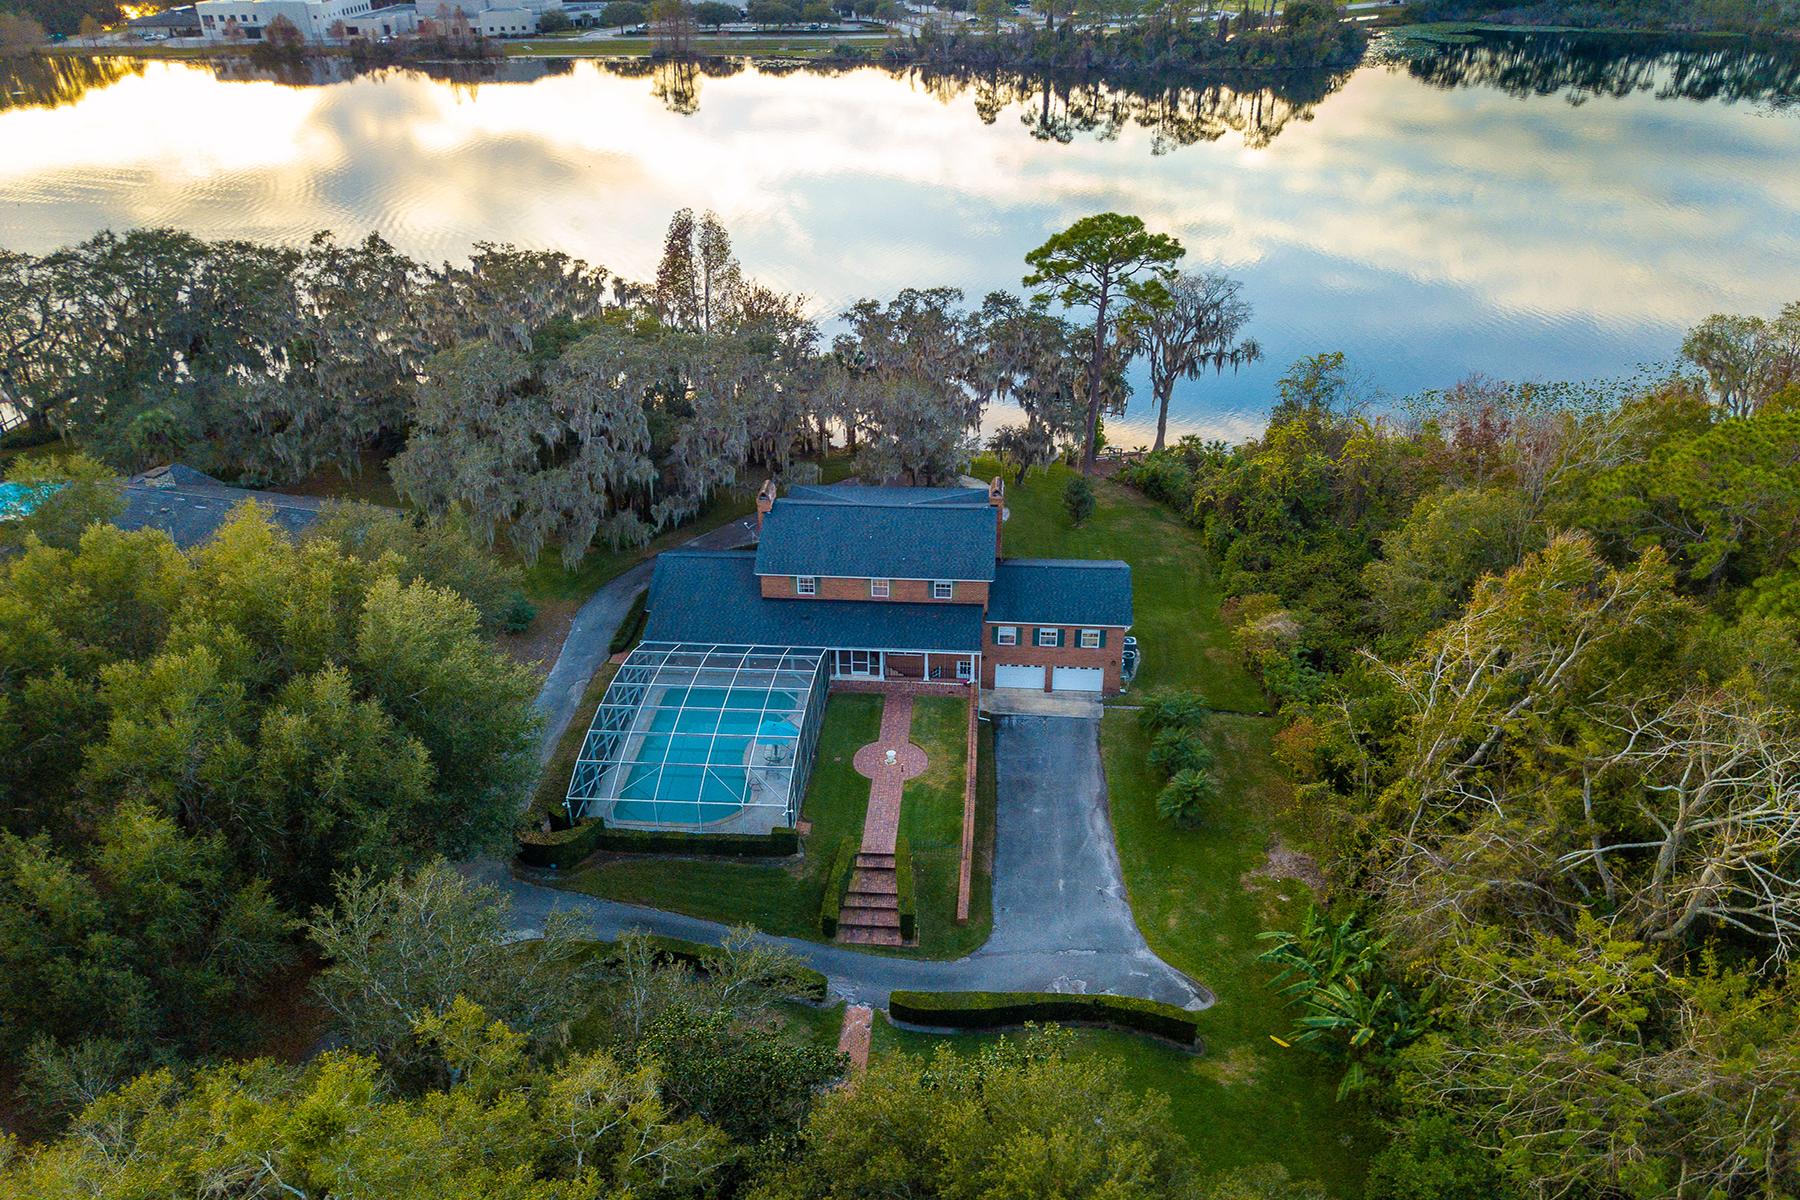 Single Family Homes for Sale at Oviedo 3680 S Tuskawilla Rd Oviedo, Florida 32765 United States